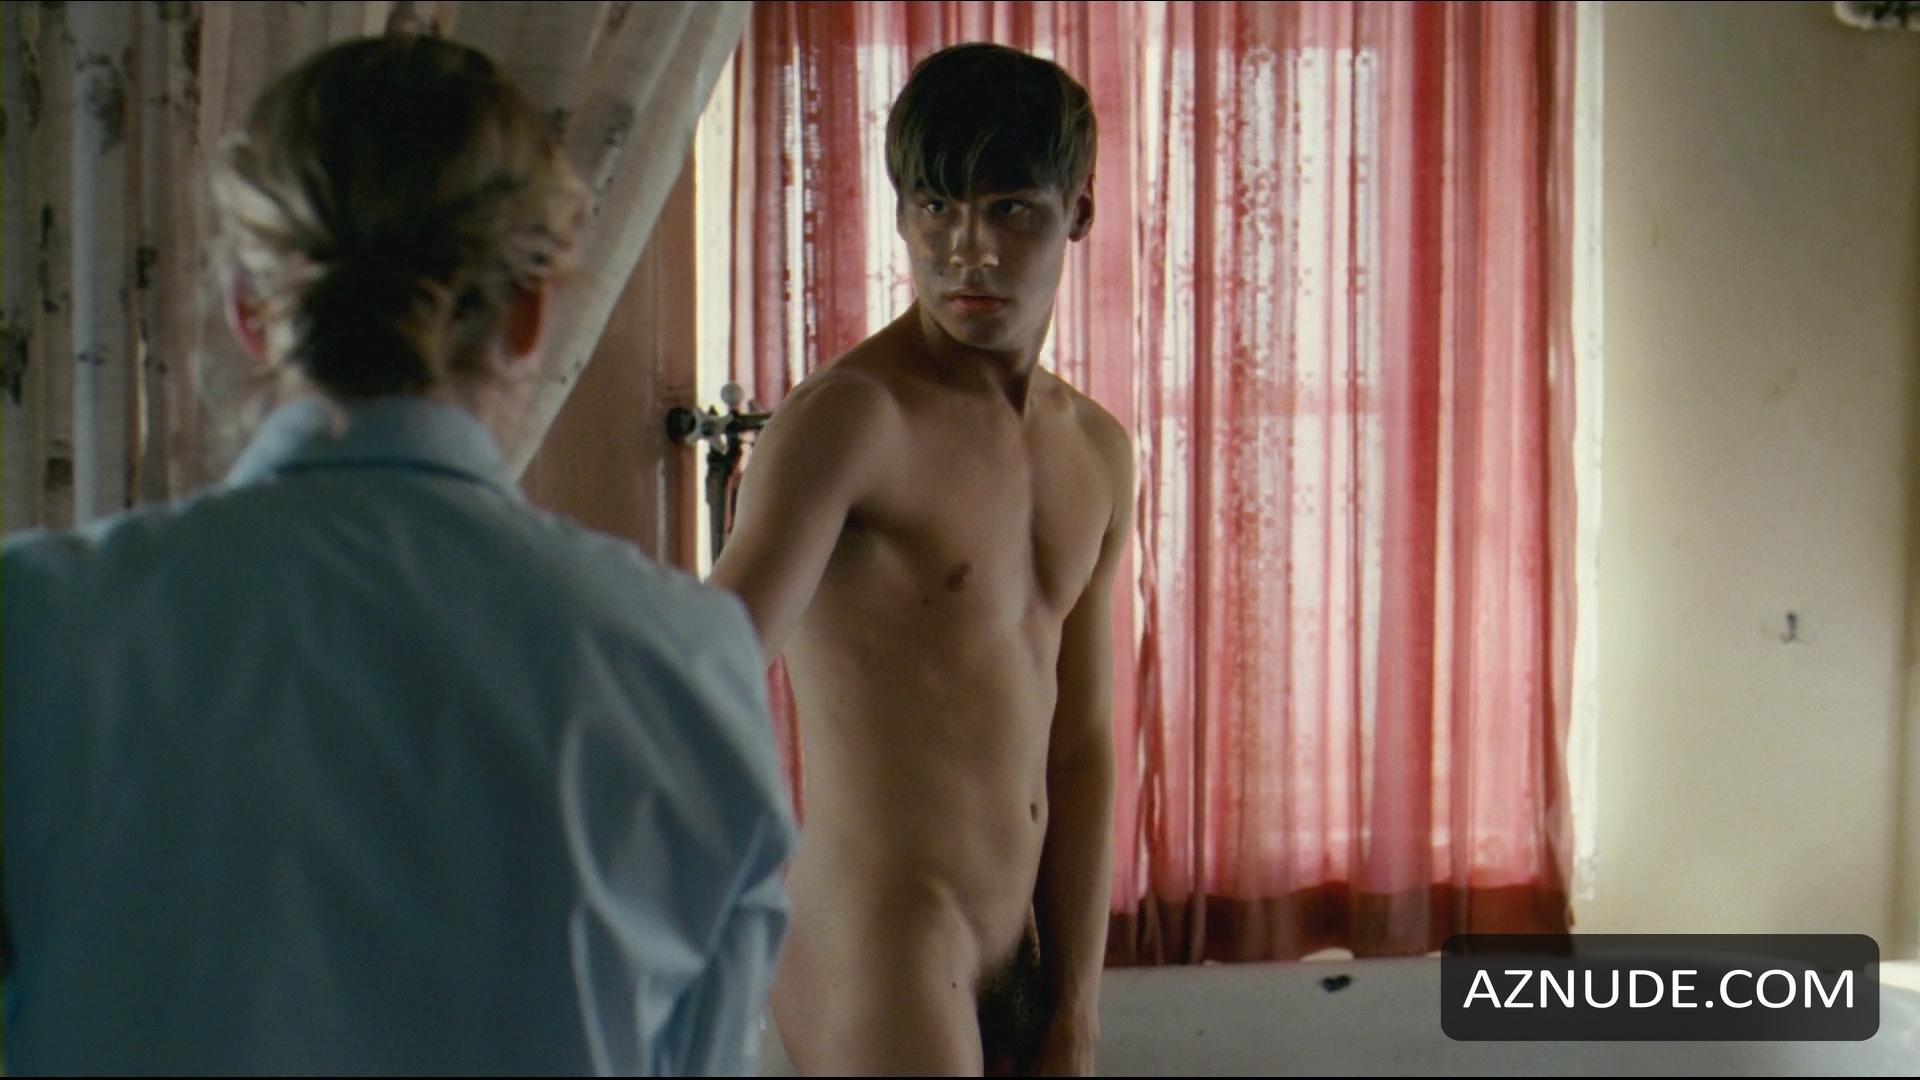 Authoritative message David kross nude scene something is